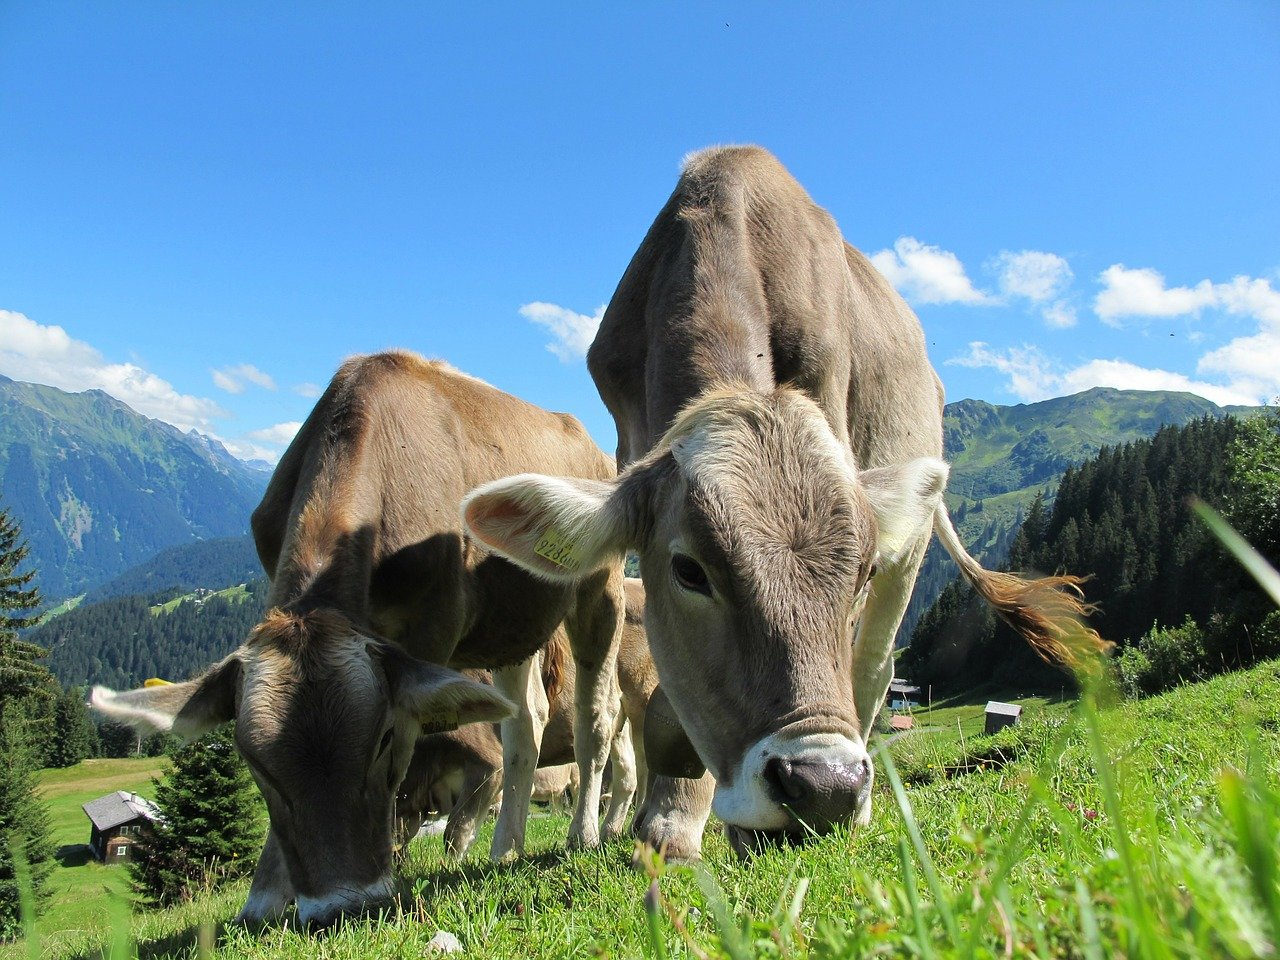 ■IoTセンサーの活用によって牛の行動を見守る|人工知能を搭載した製品・サービスの比較一覧・導入活用事例・資料請求が無料でできるAIポータルメディア